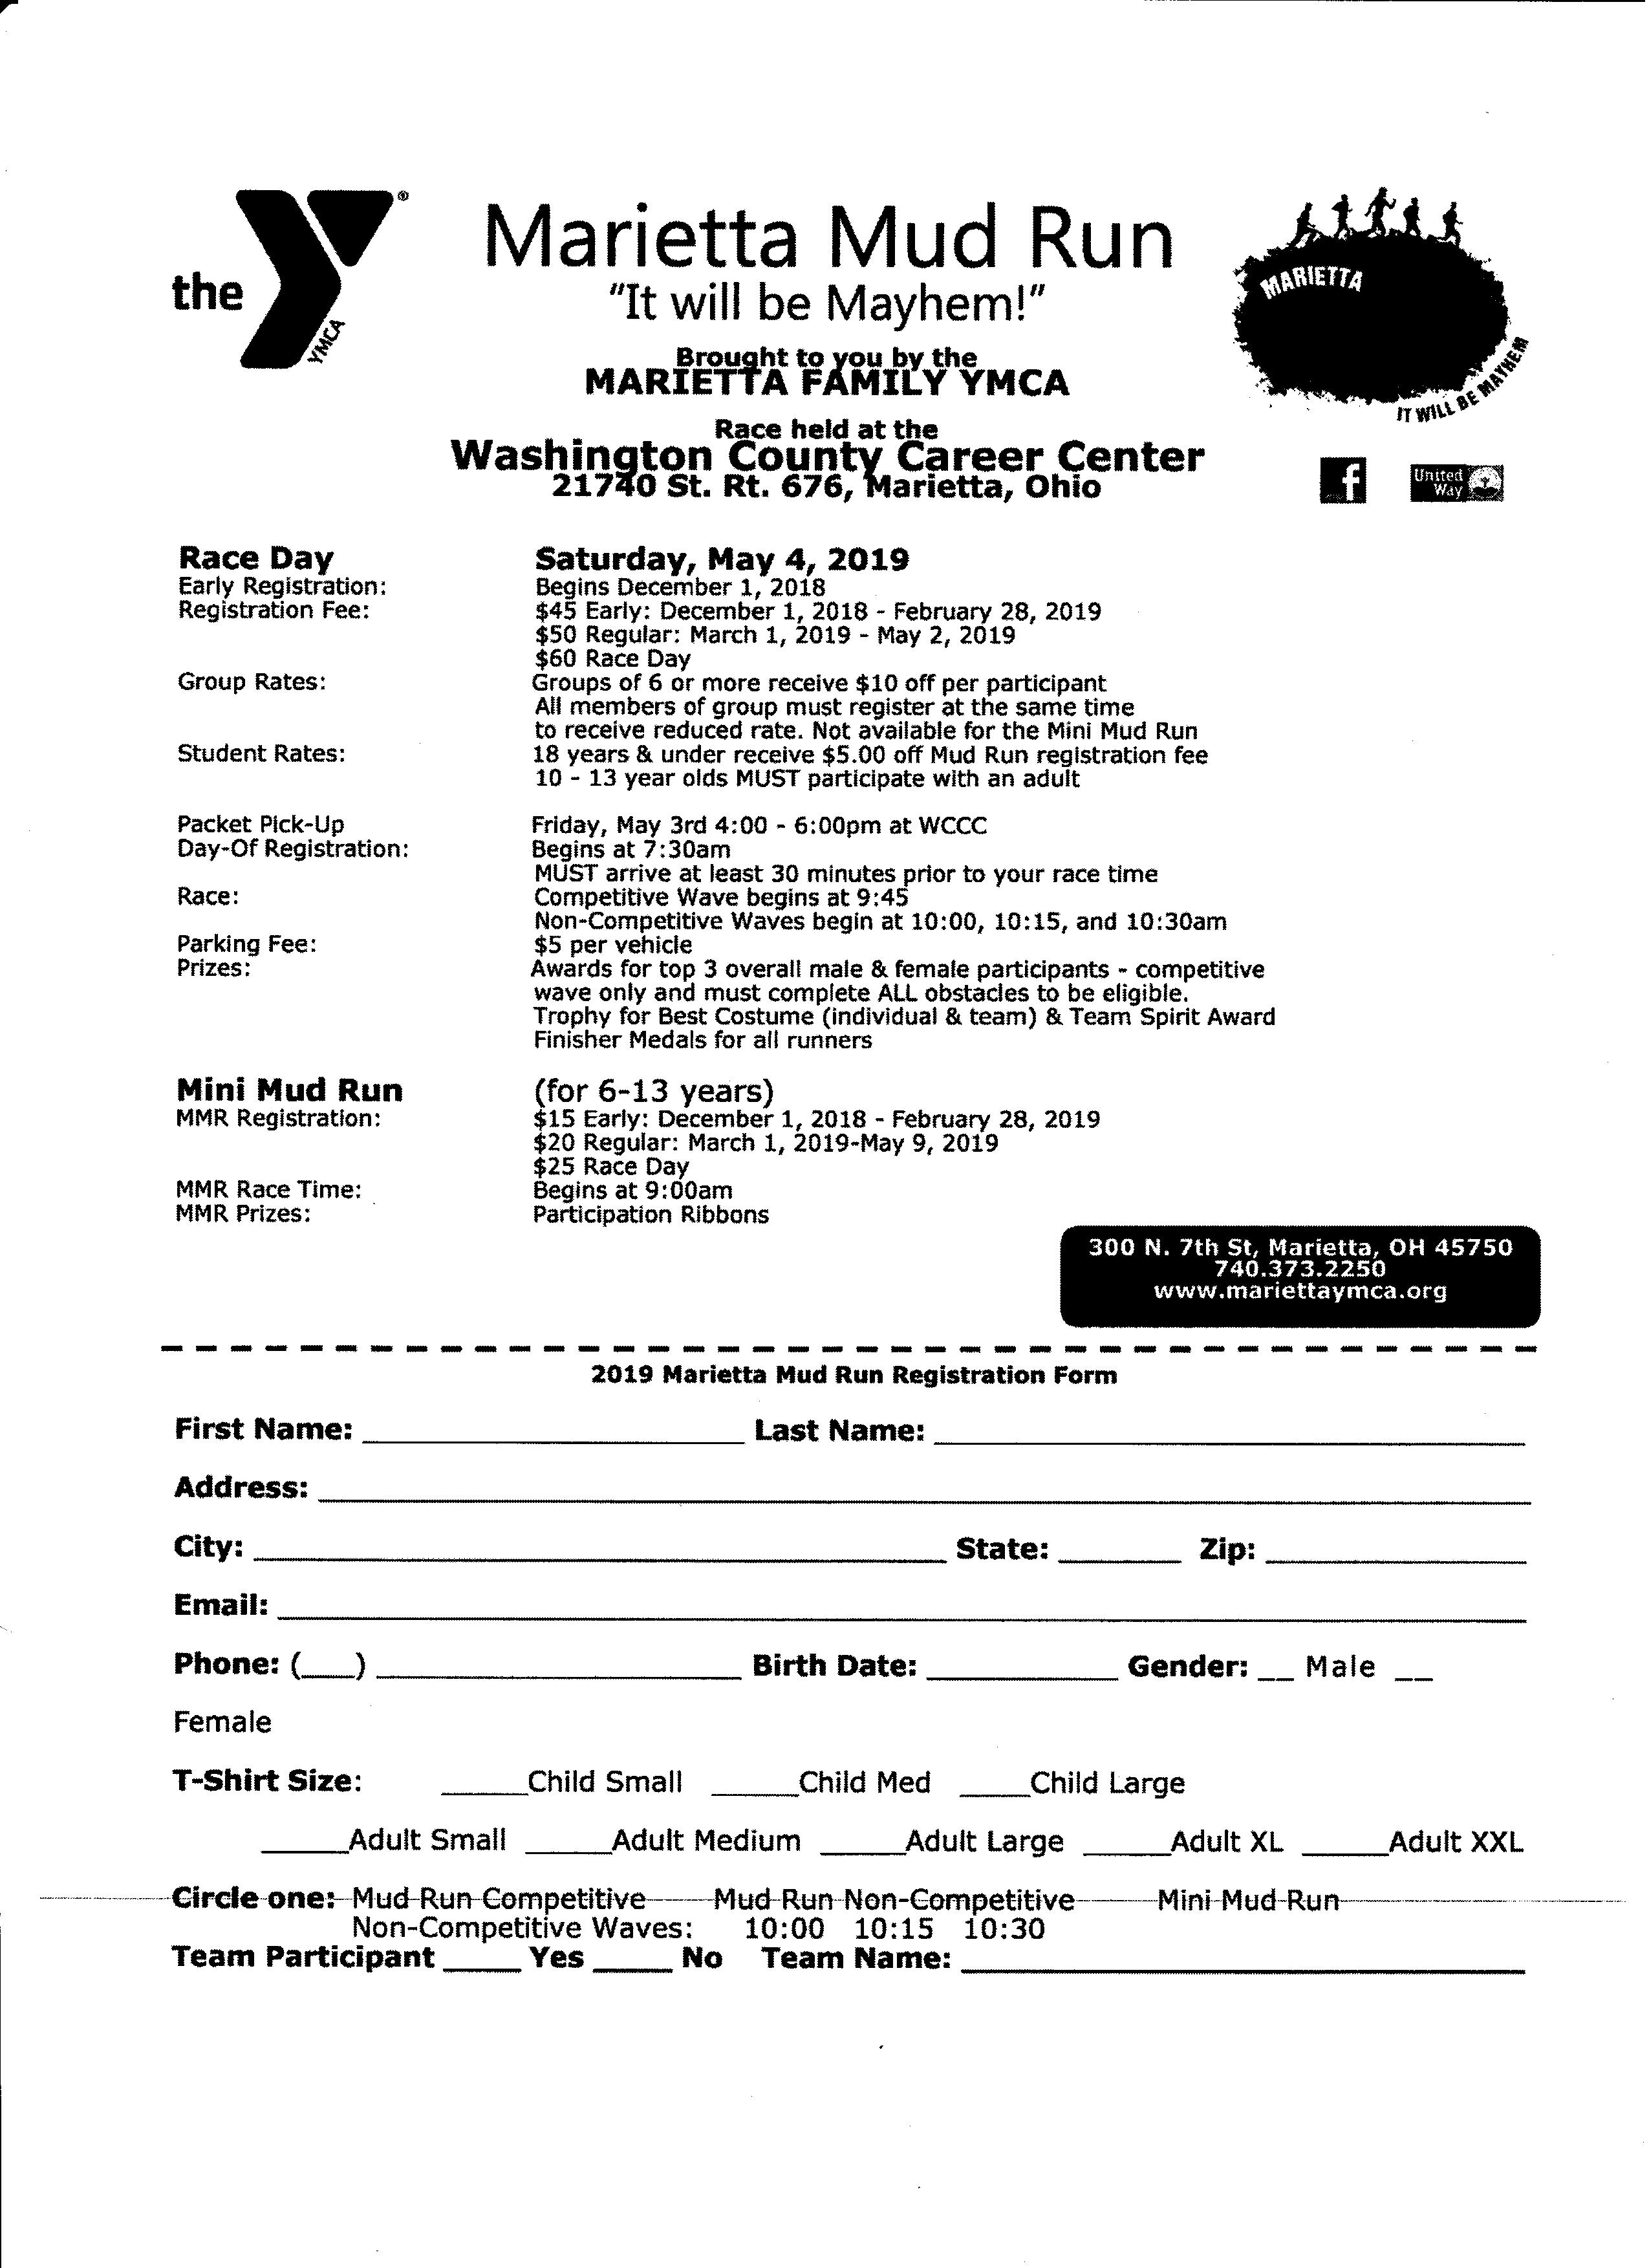 Marietta YMCA Mud Run — River City Runners and Walkers Club